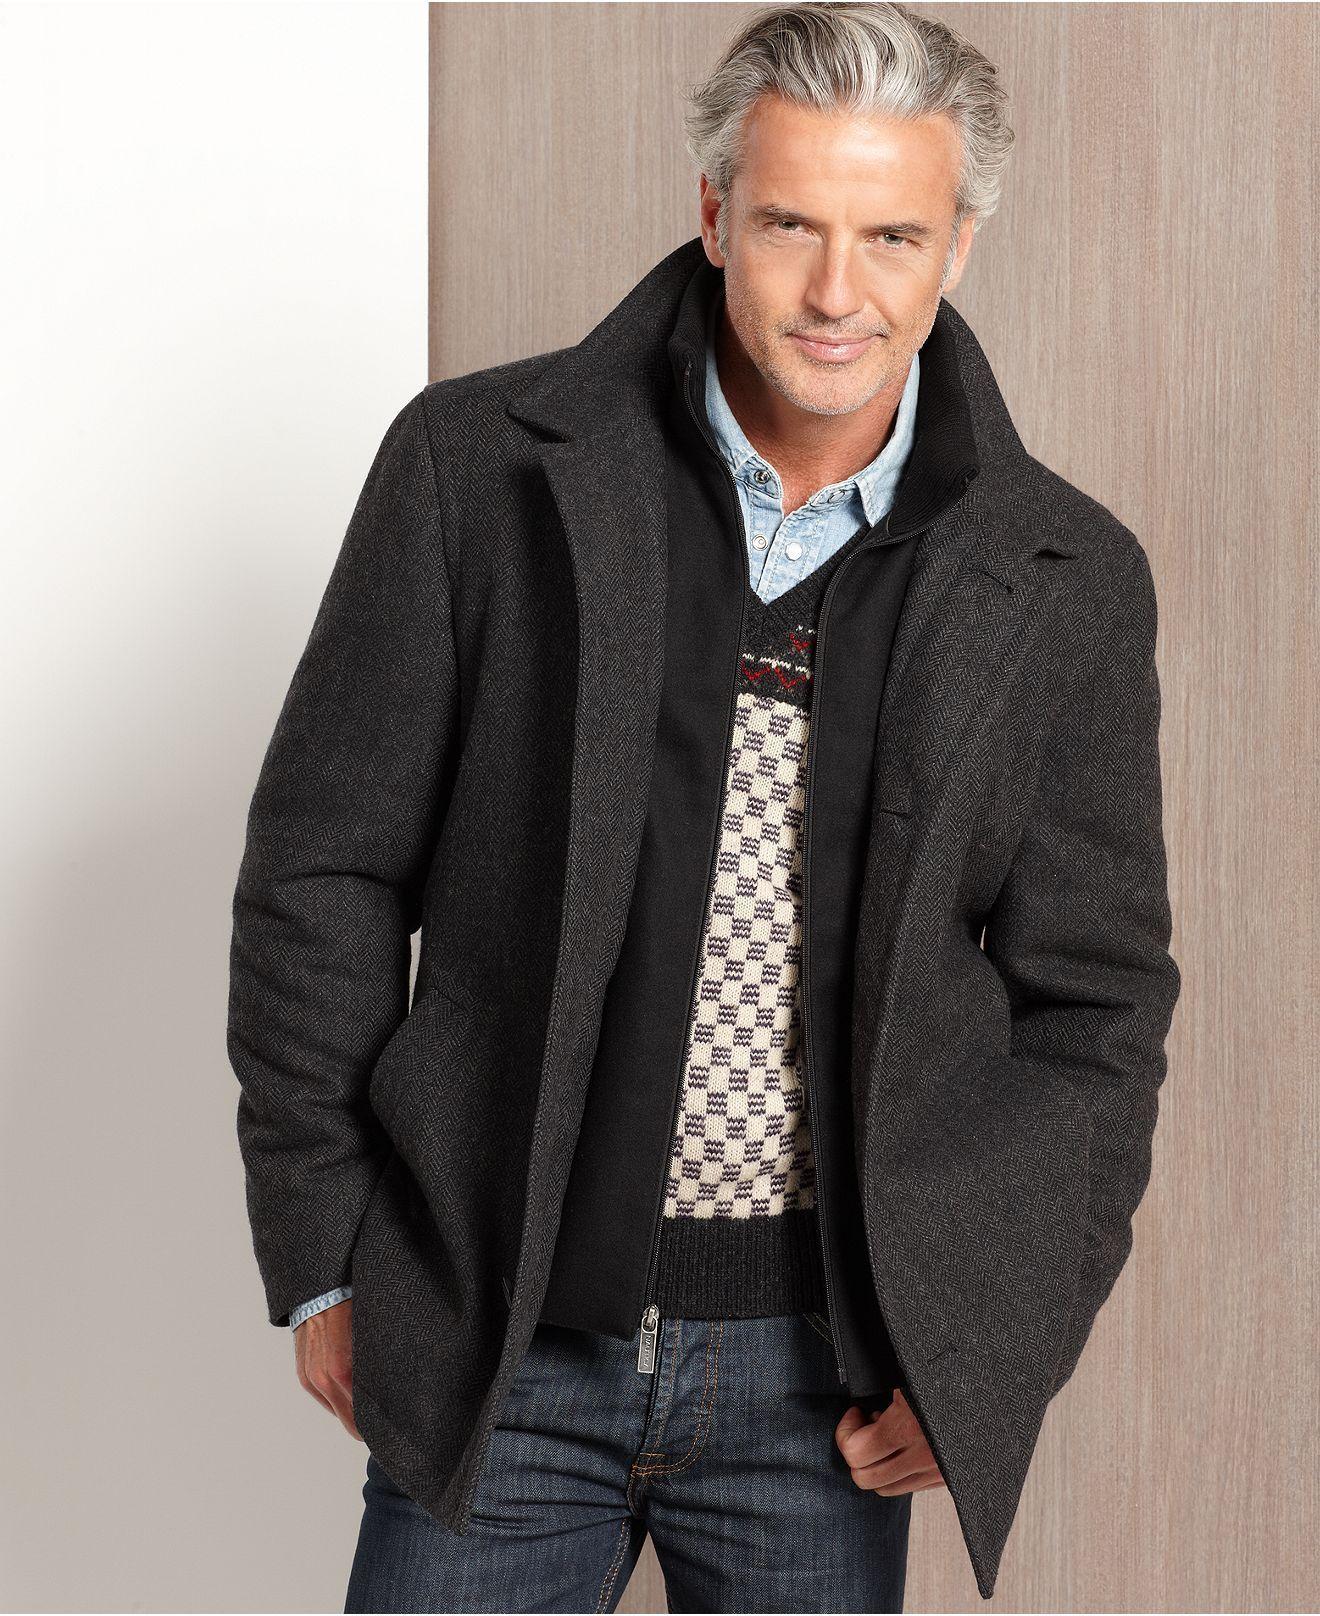 Nautica Jacket Melton Wool Blend Coat With Knit Collar Macy S Wool Blend Coat Clothes Jackets [ 1616 x 1320 Pixel ]